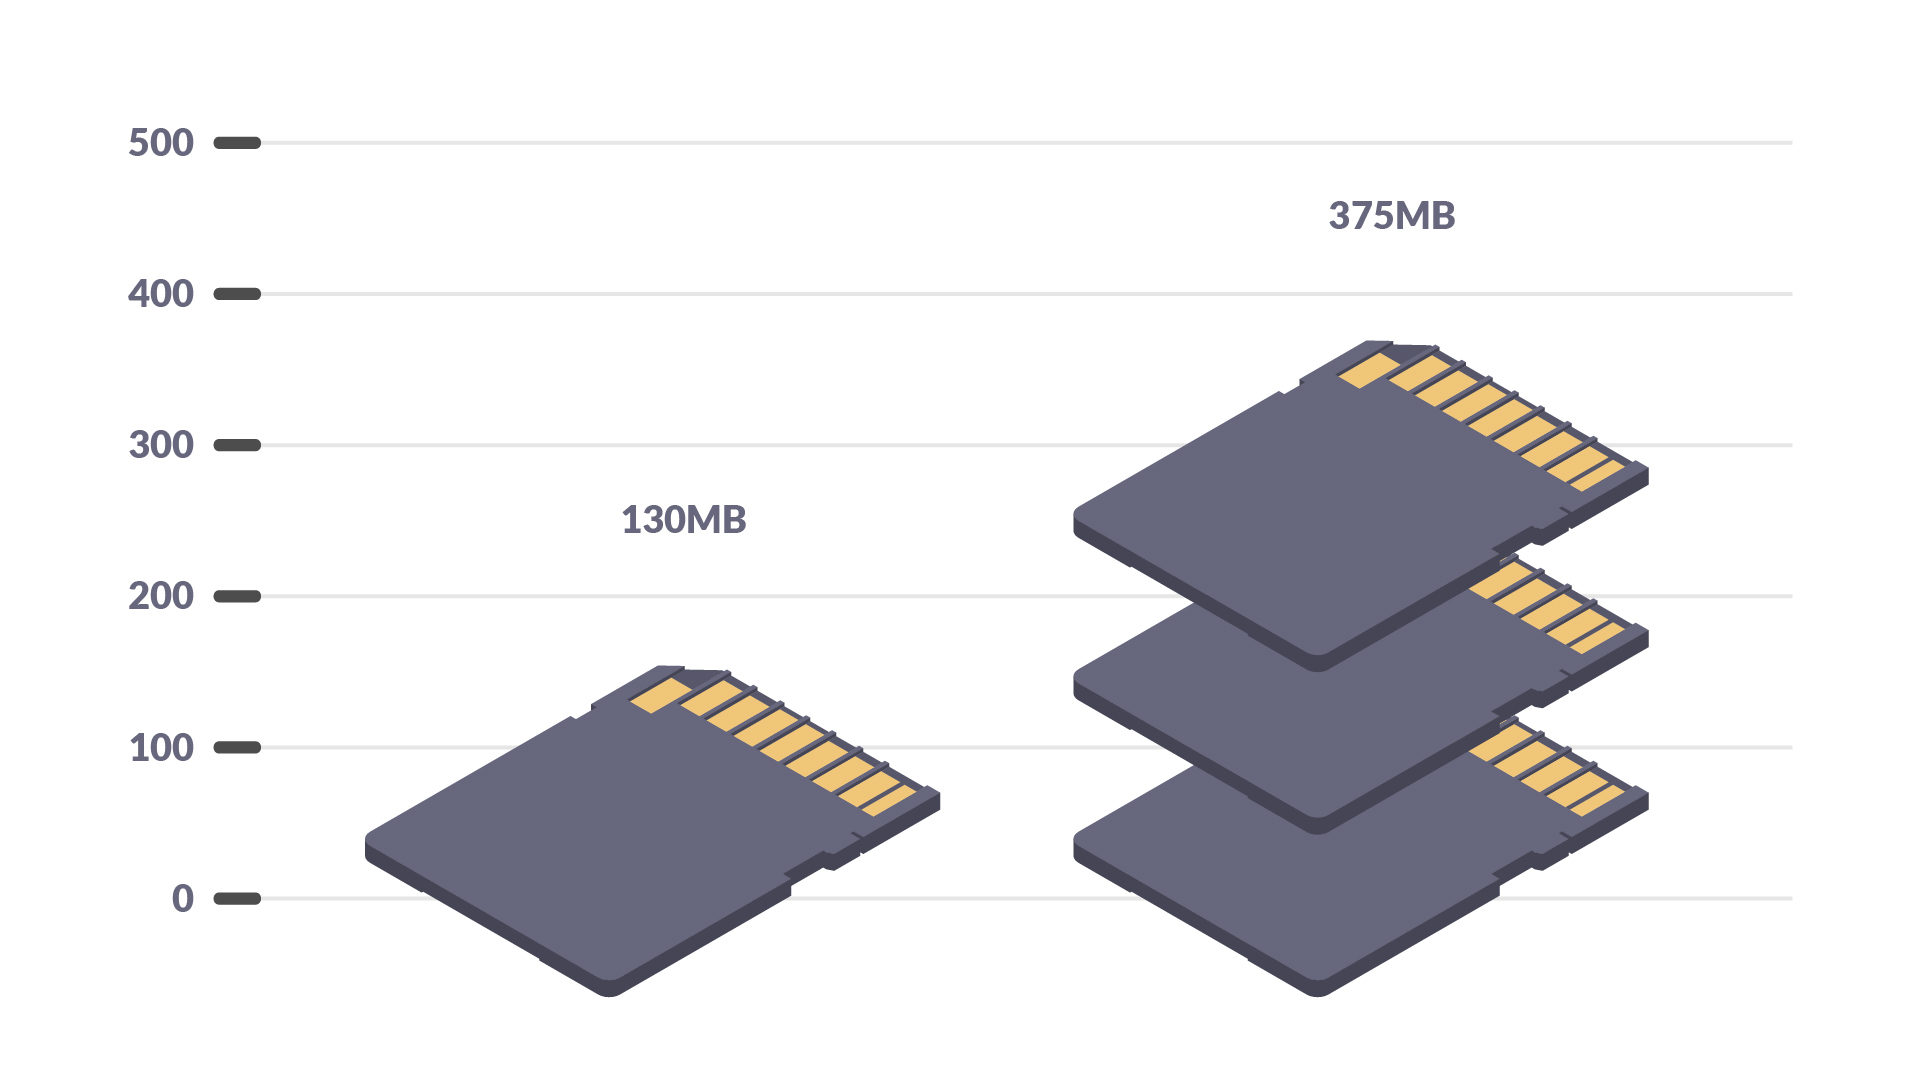 4K vs 1080p storage requirements visualisation